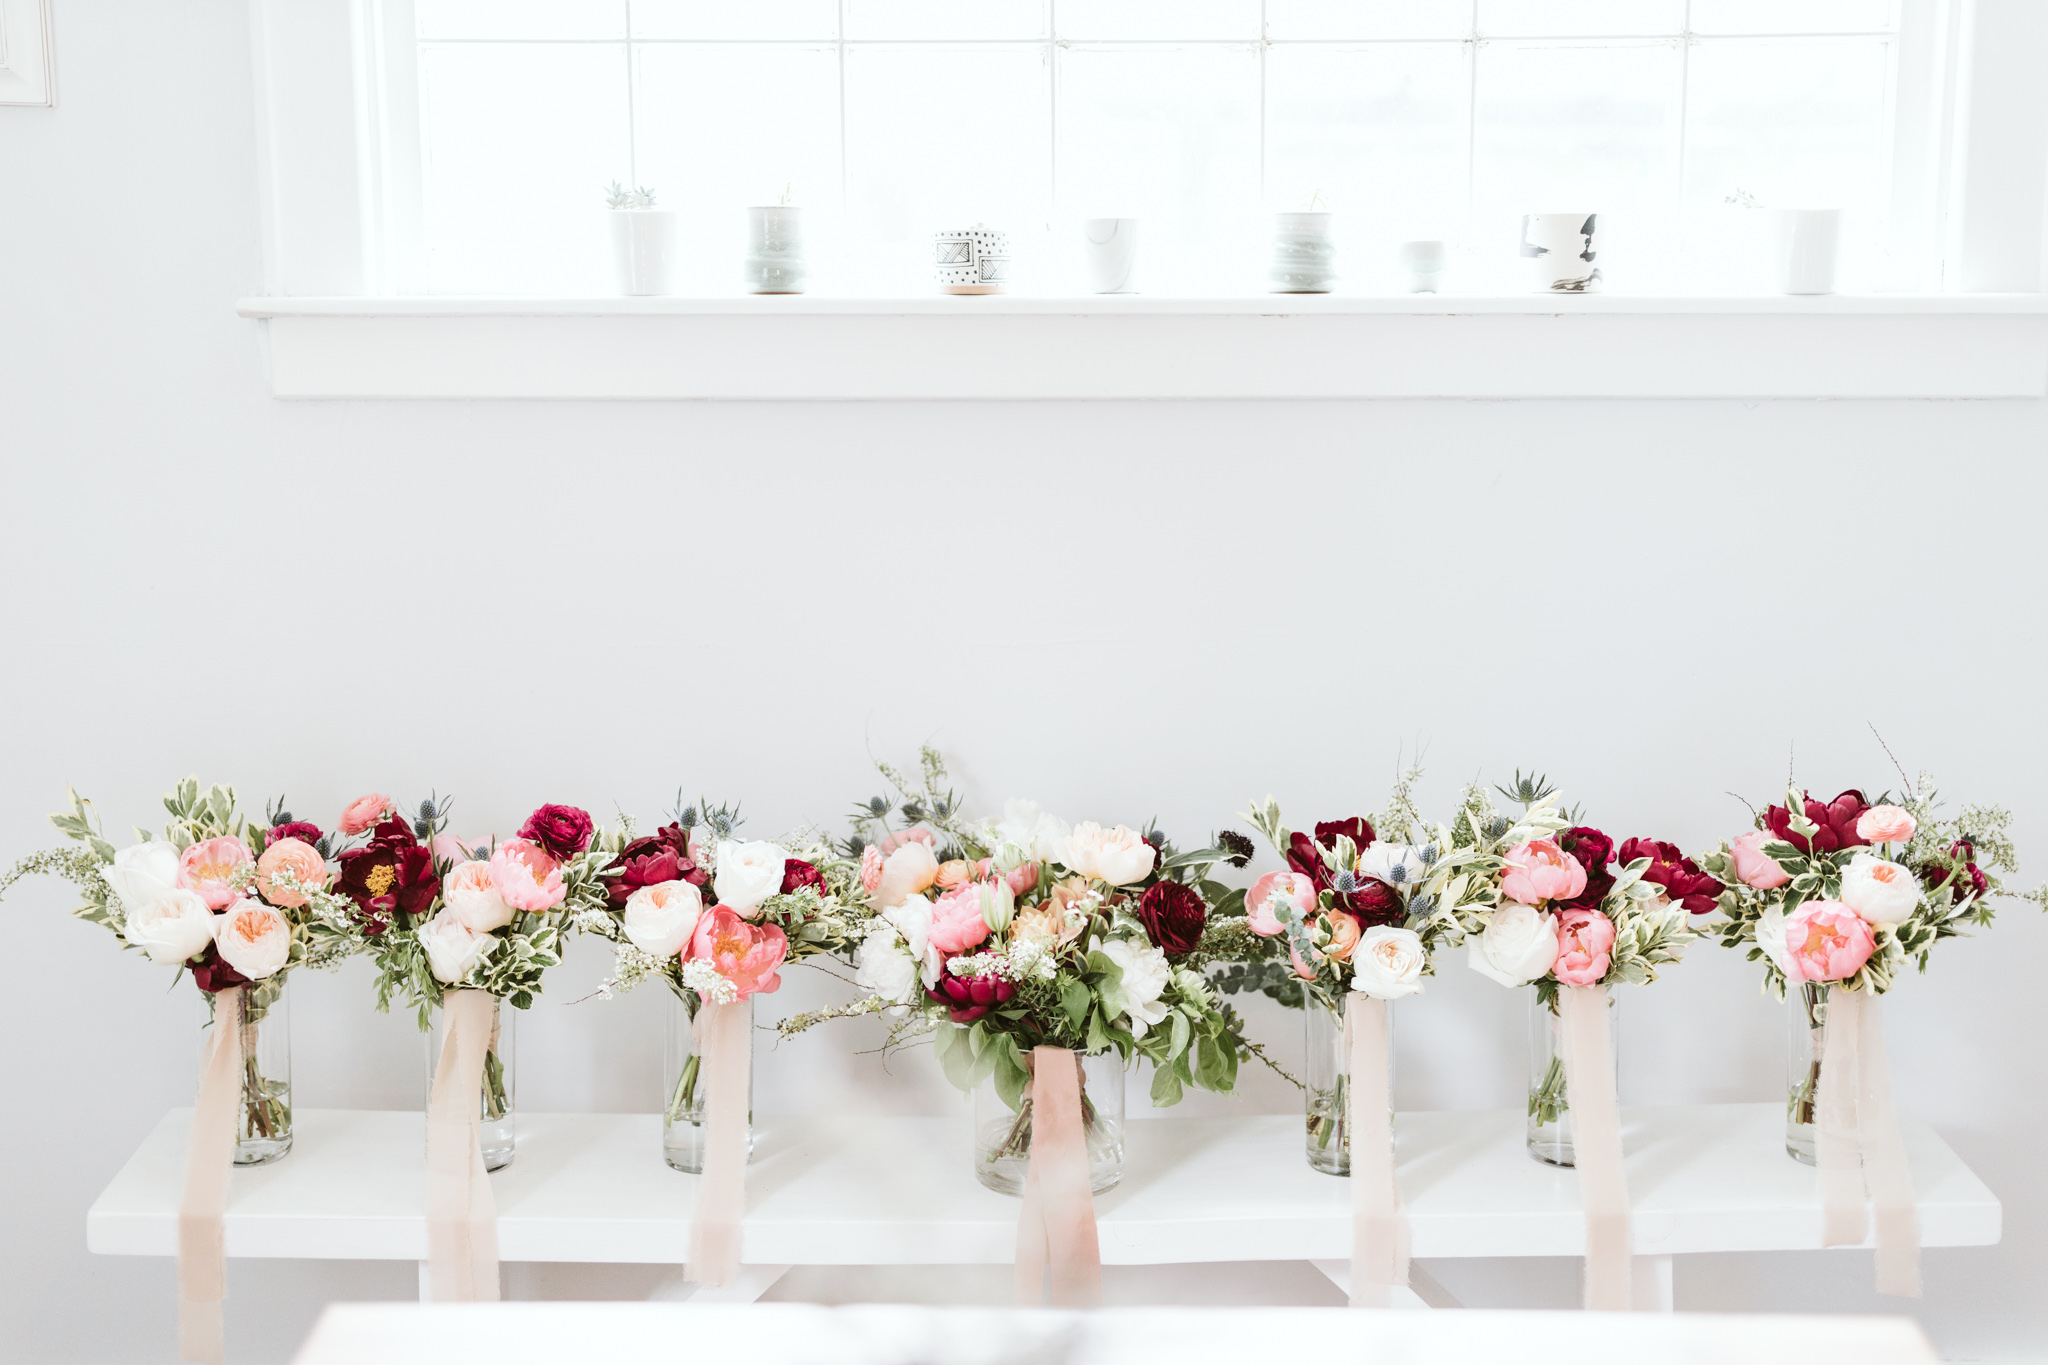 Olive_and_June_Florals-8.jpg